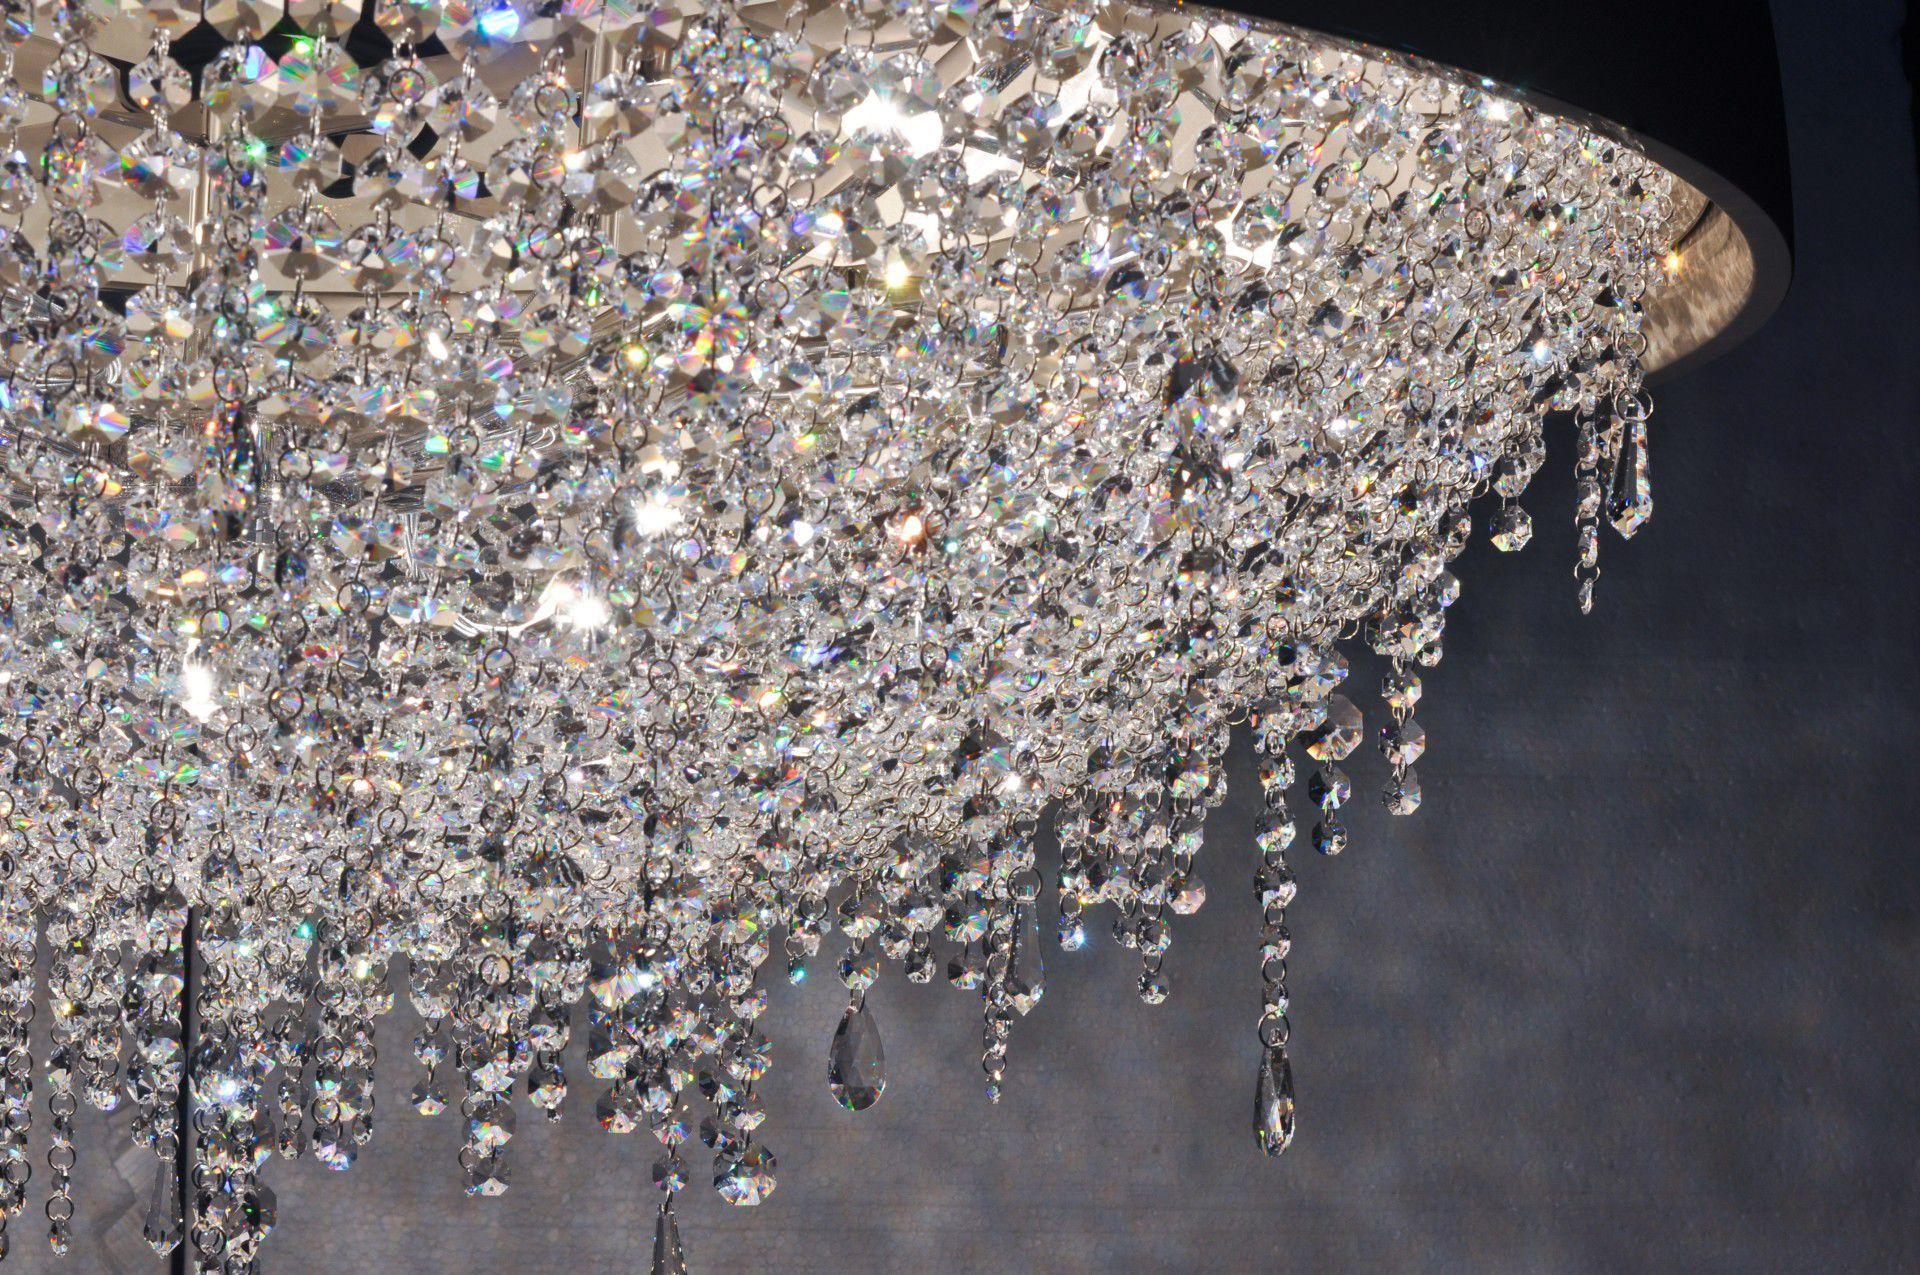 lampadari in cristallo : Lampadari in cristallo: pulirli - Blog Agenzia Stella Cadente